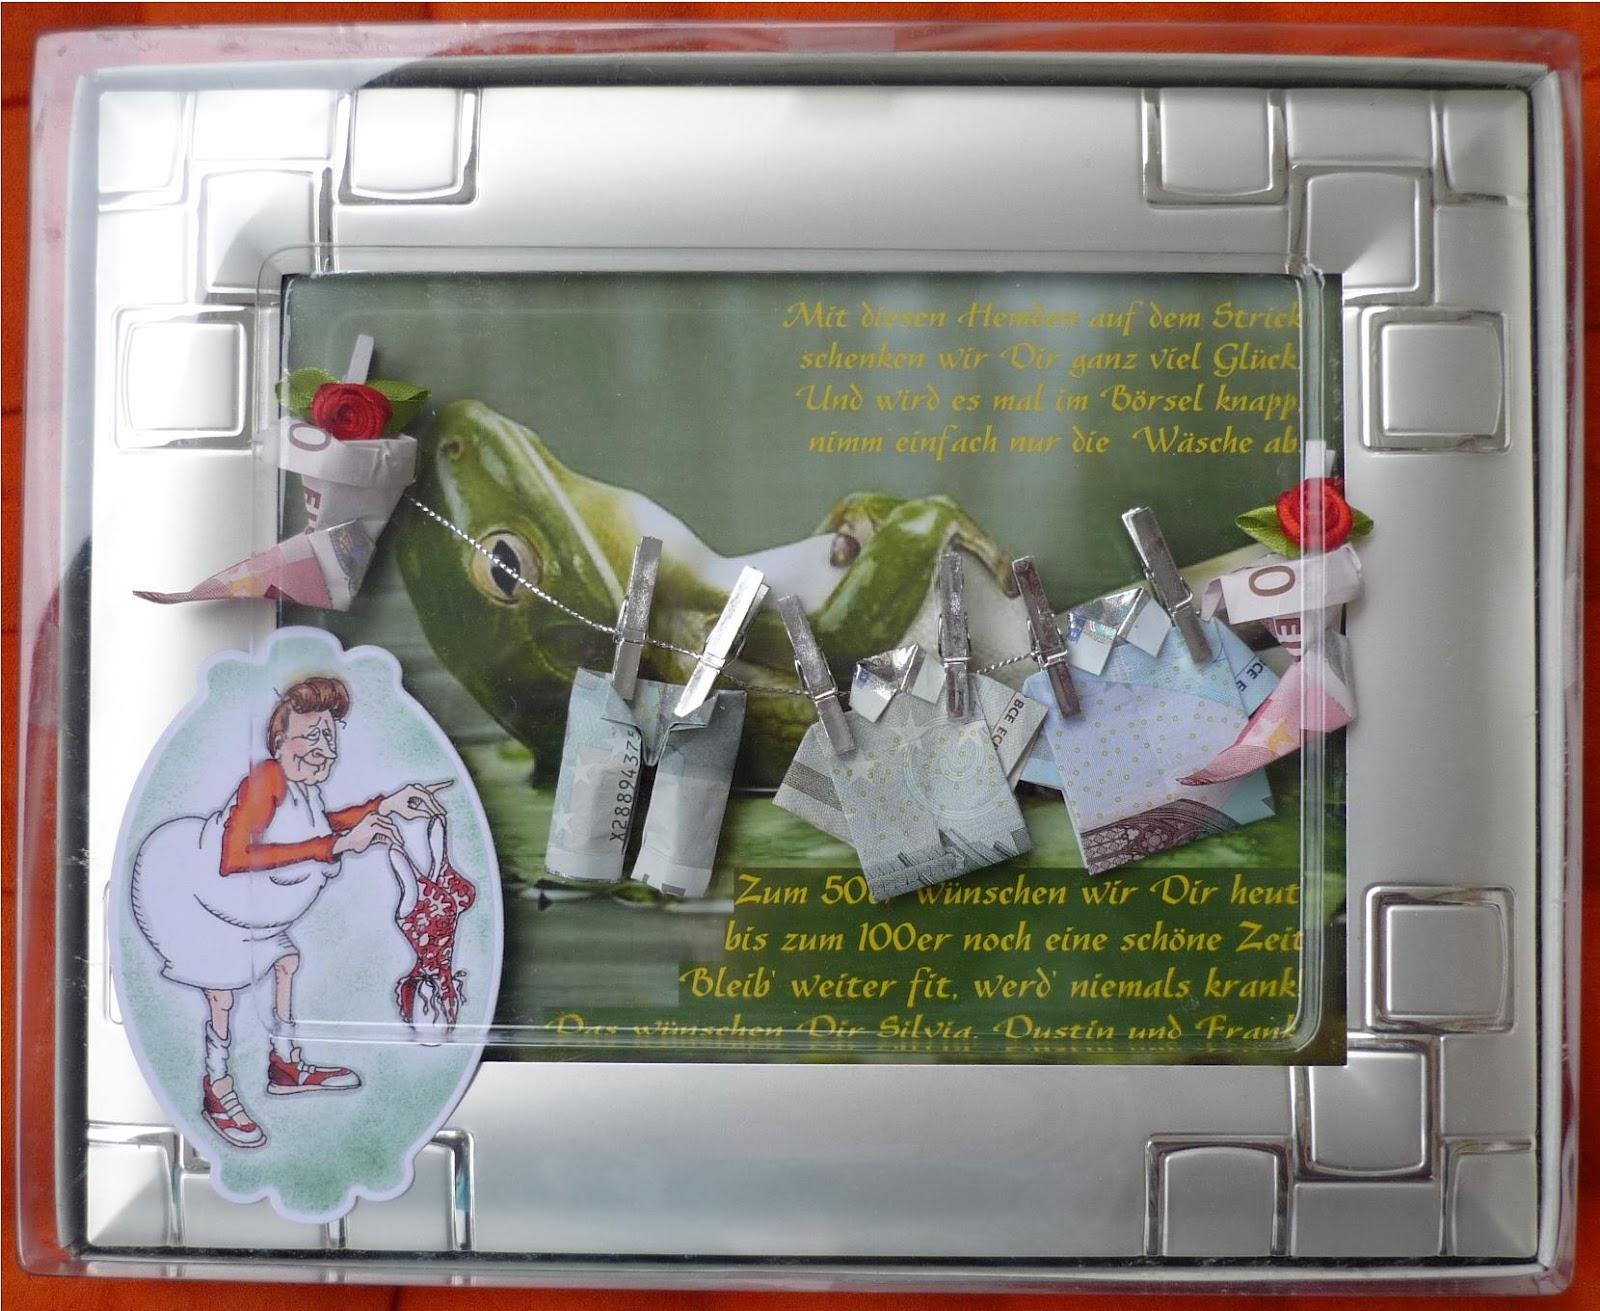 Geschenkideen Zum 50 Geburtstag Frau Krautergarten Als Geschenk